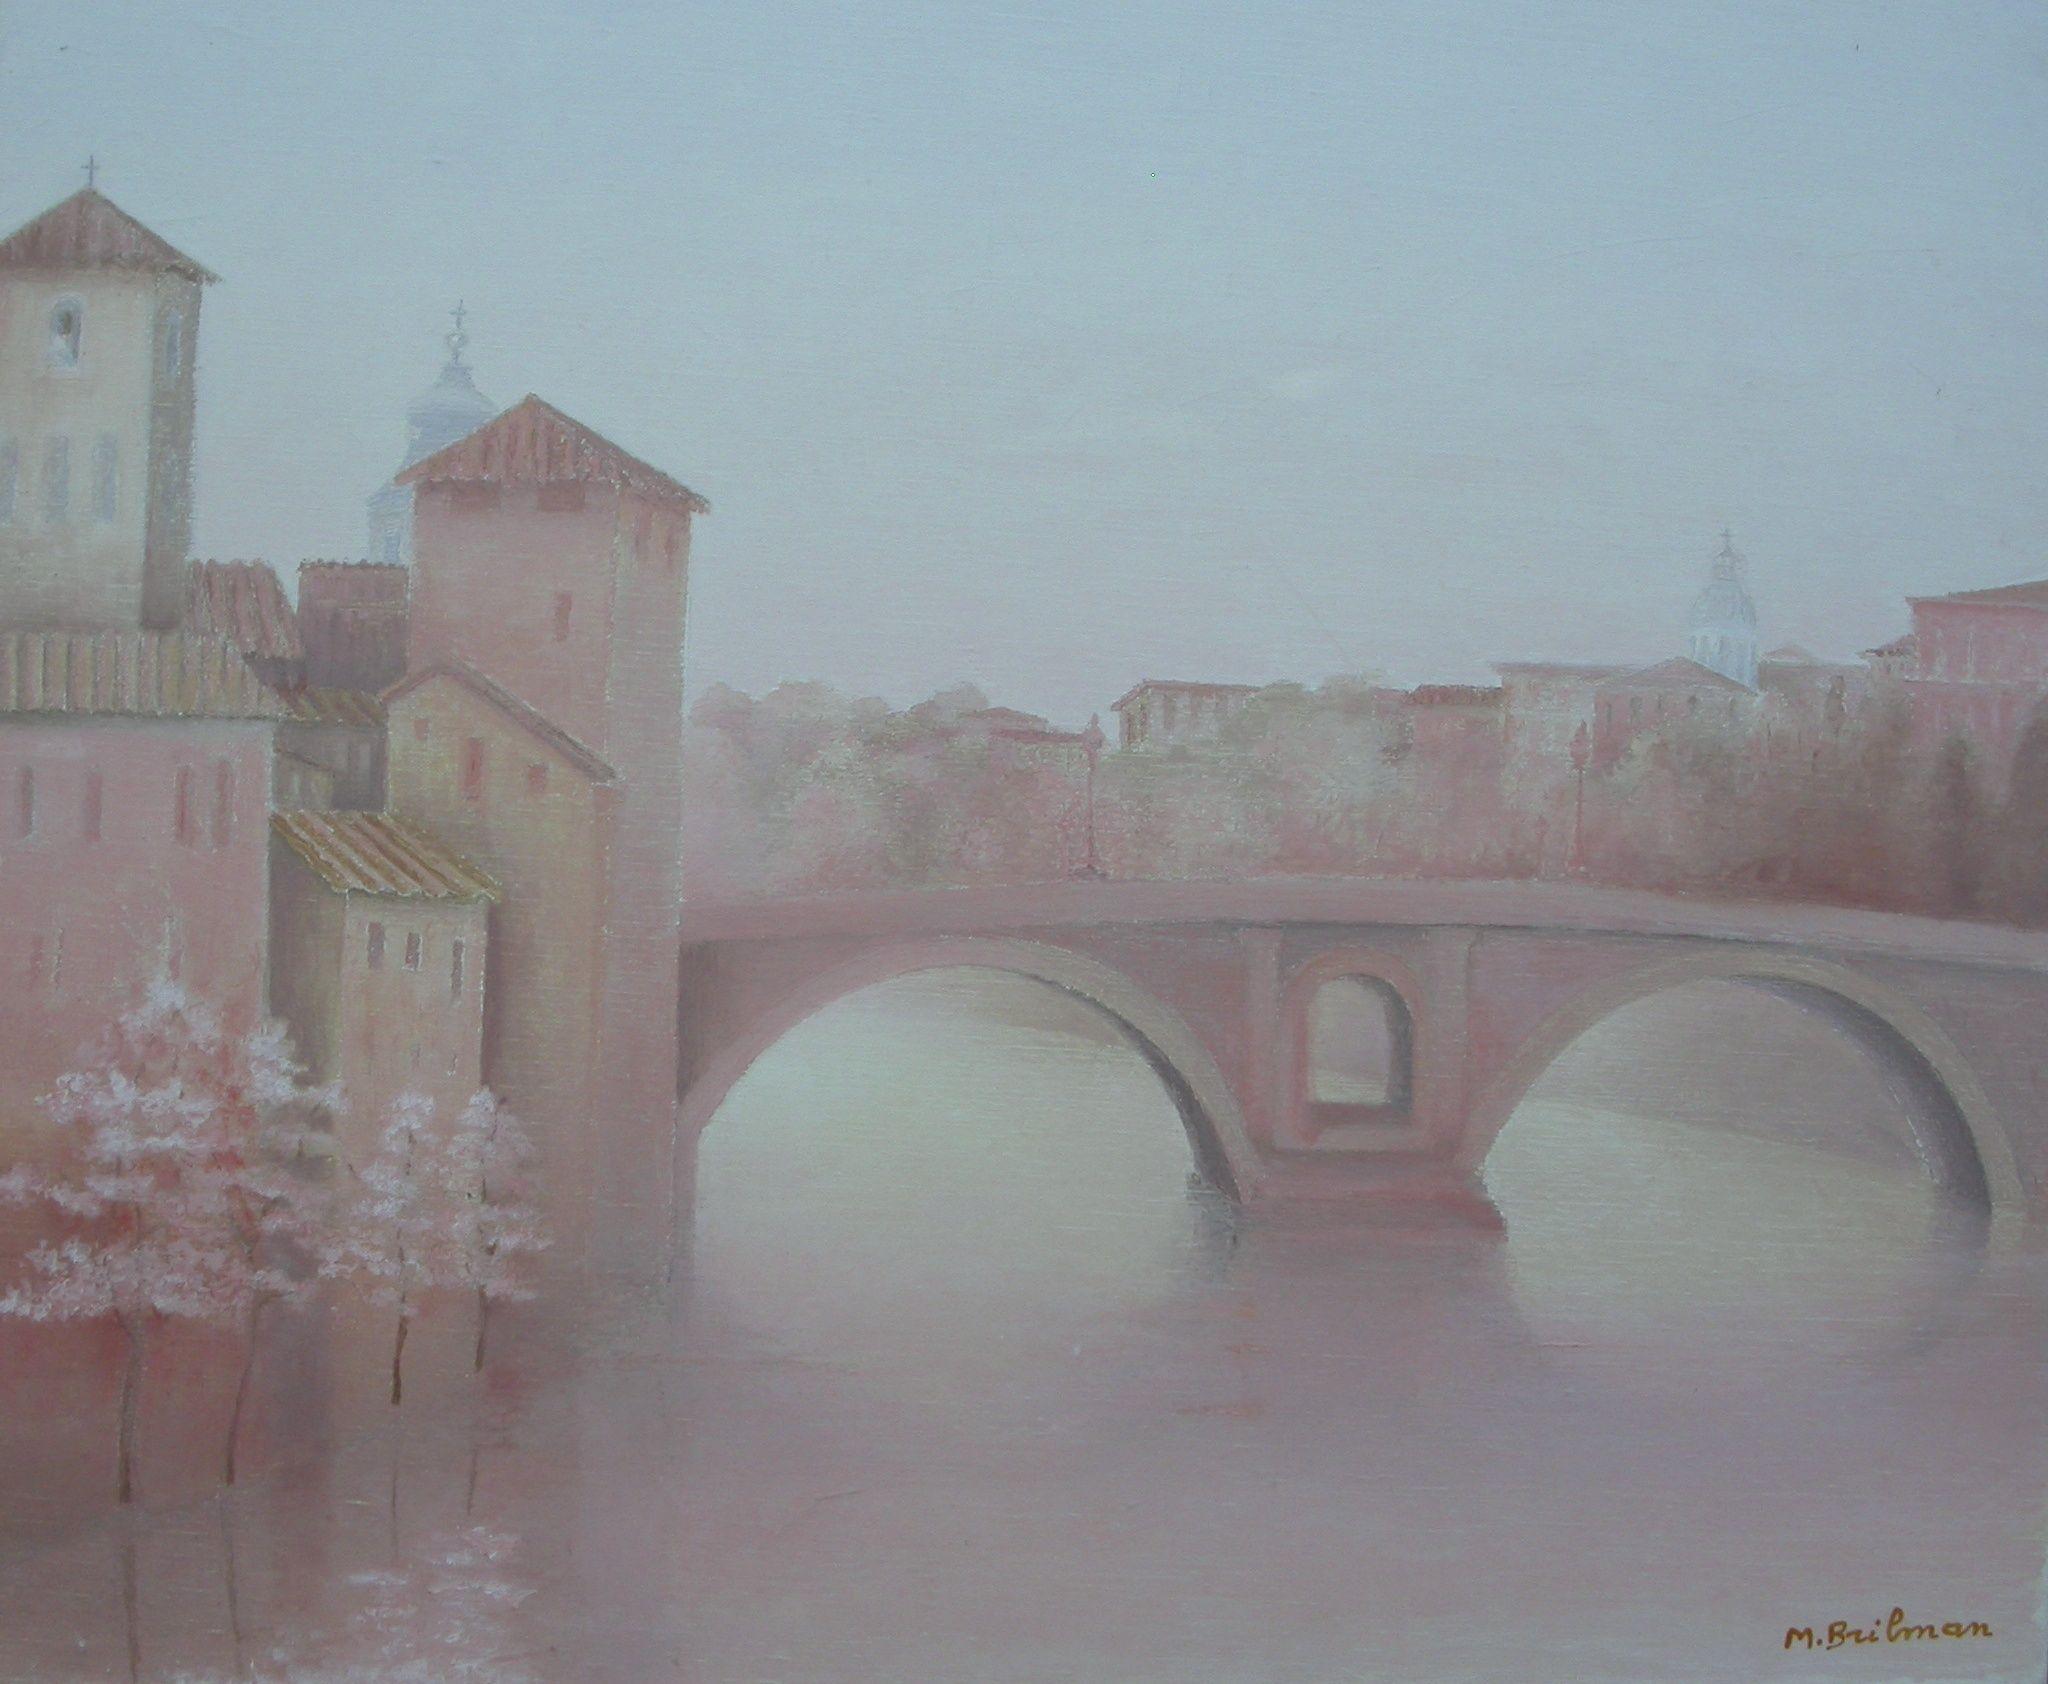 The Fabricio bridge, Rome